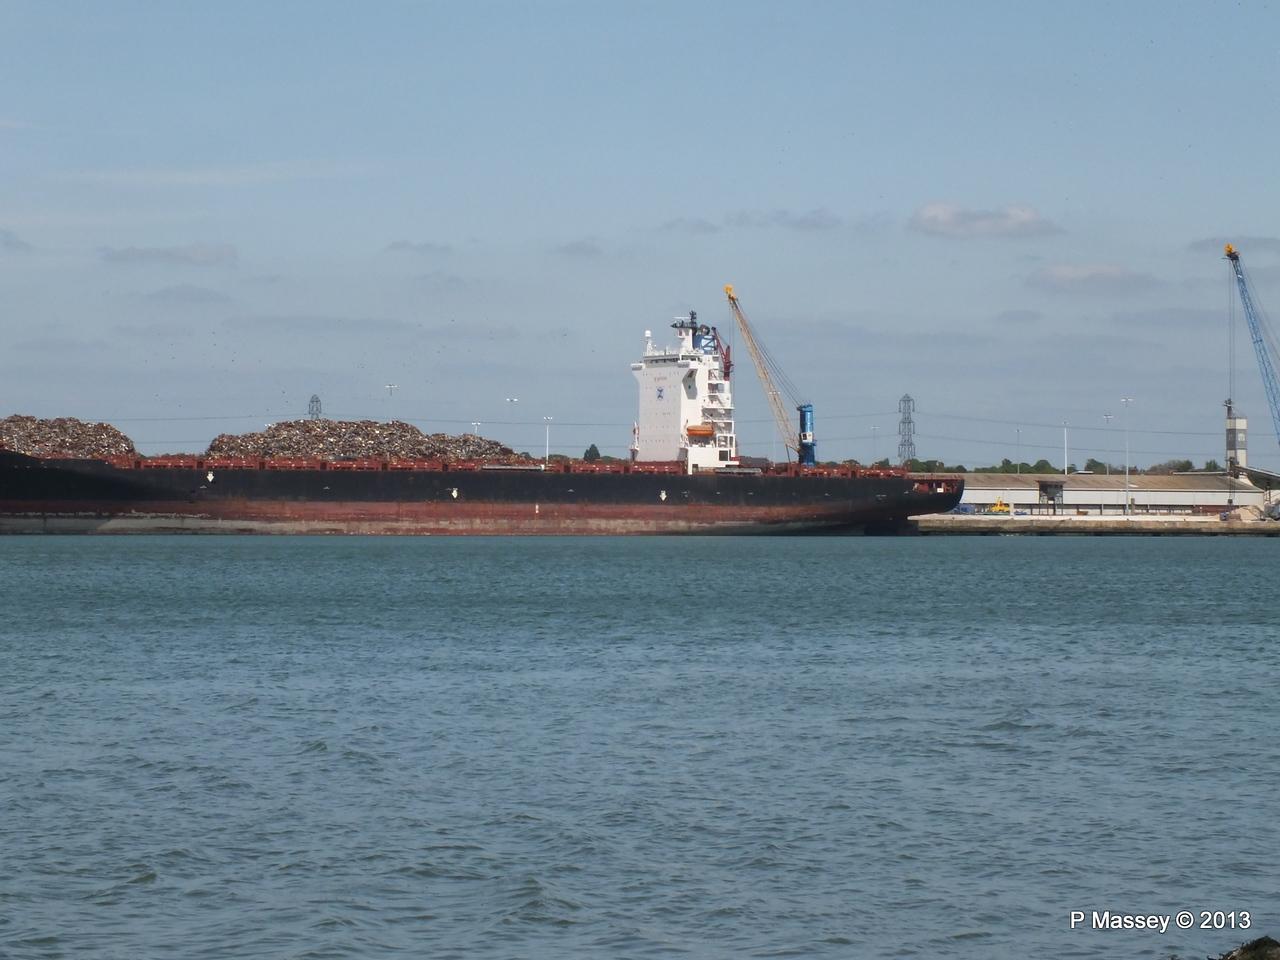 QINGDAO TOWER berth 109 Southampton PDM 01-06-2013 14-57-06